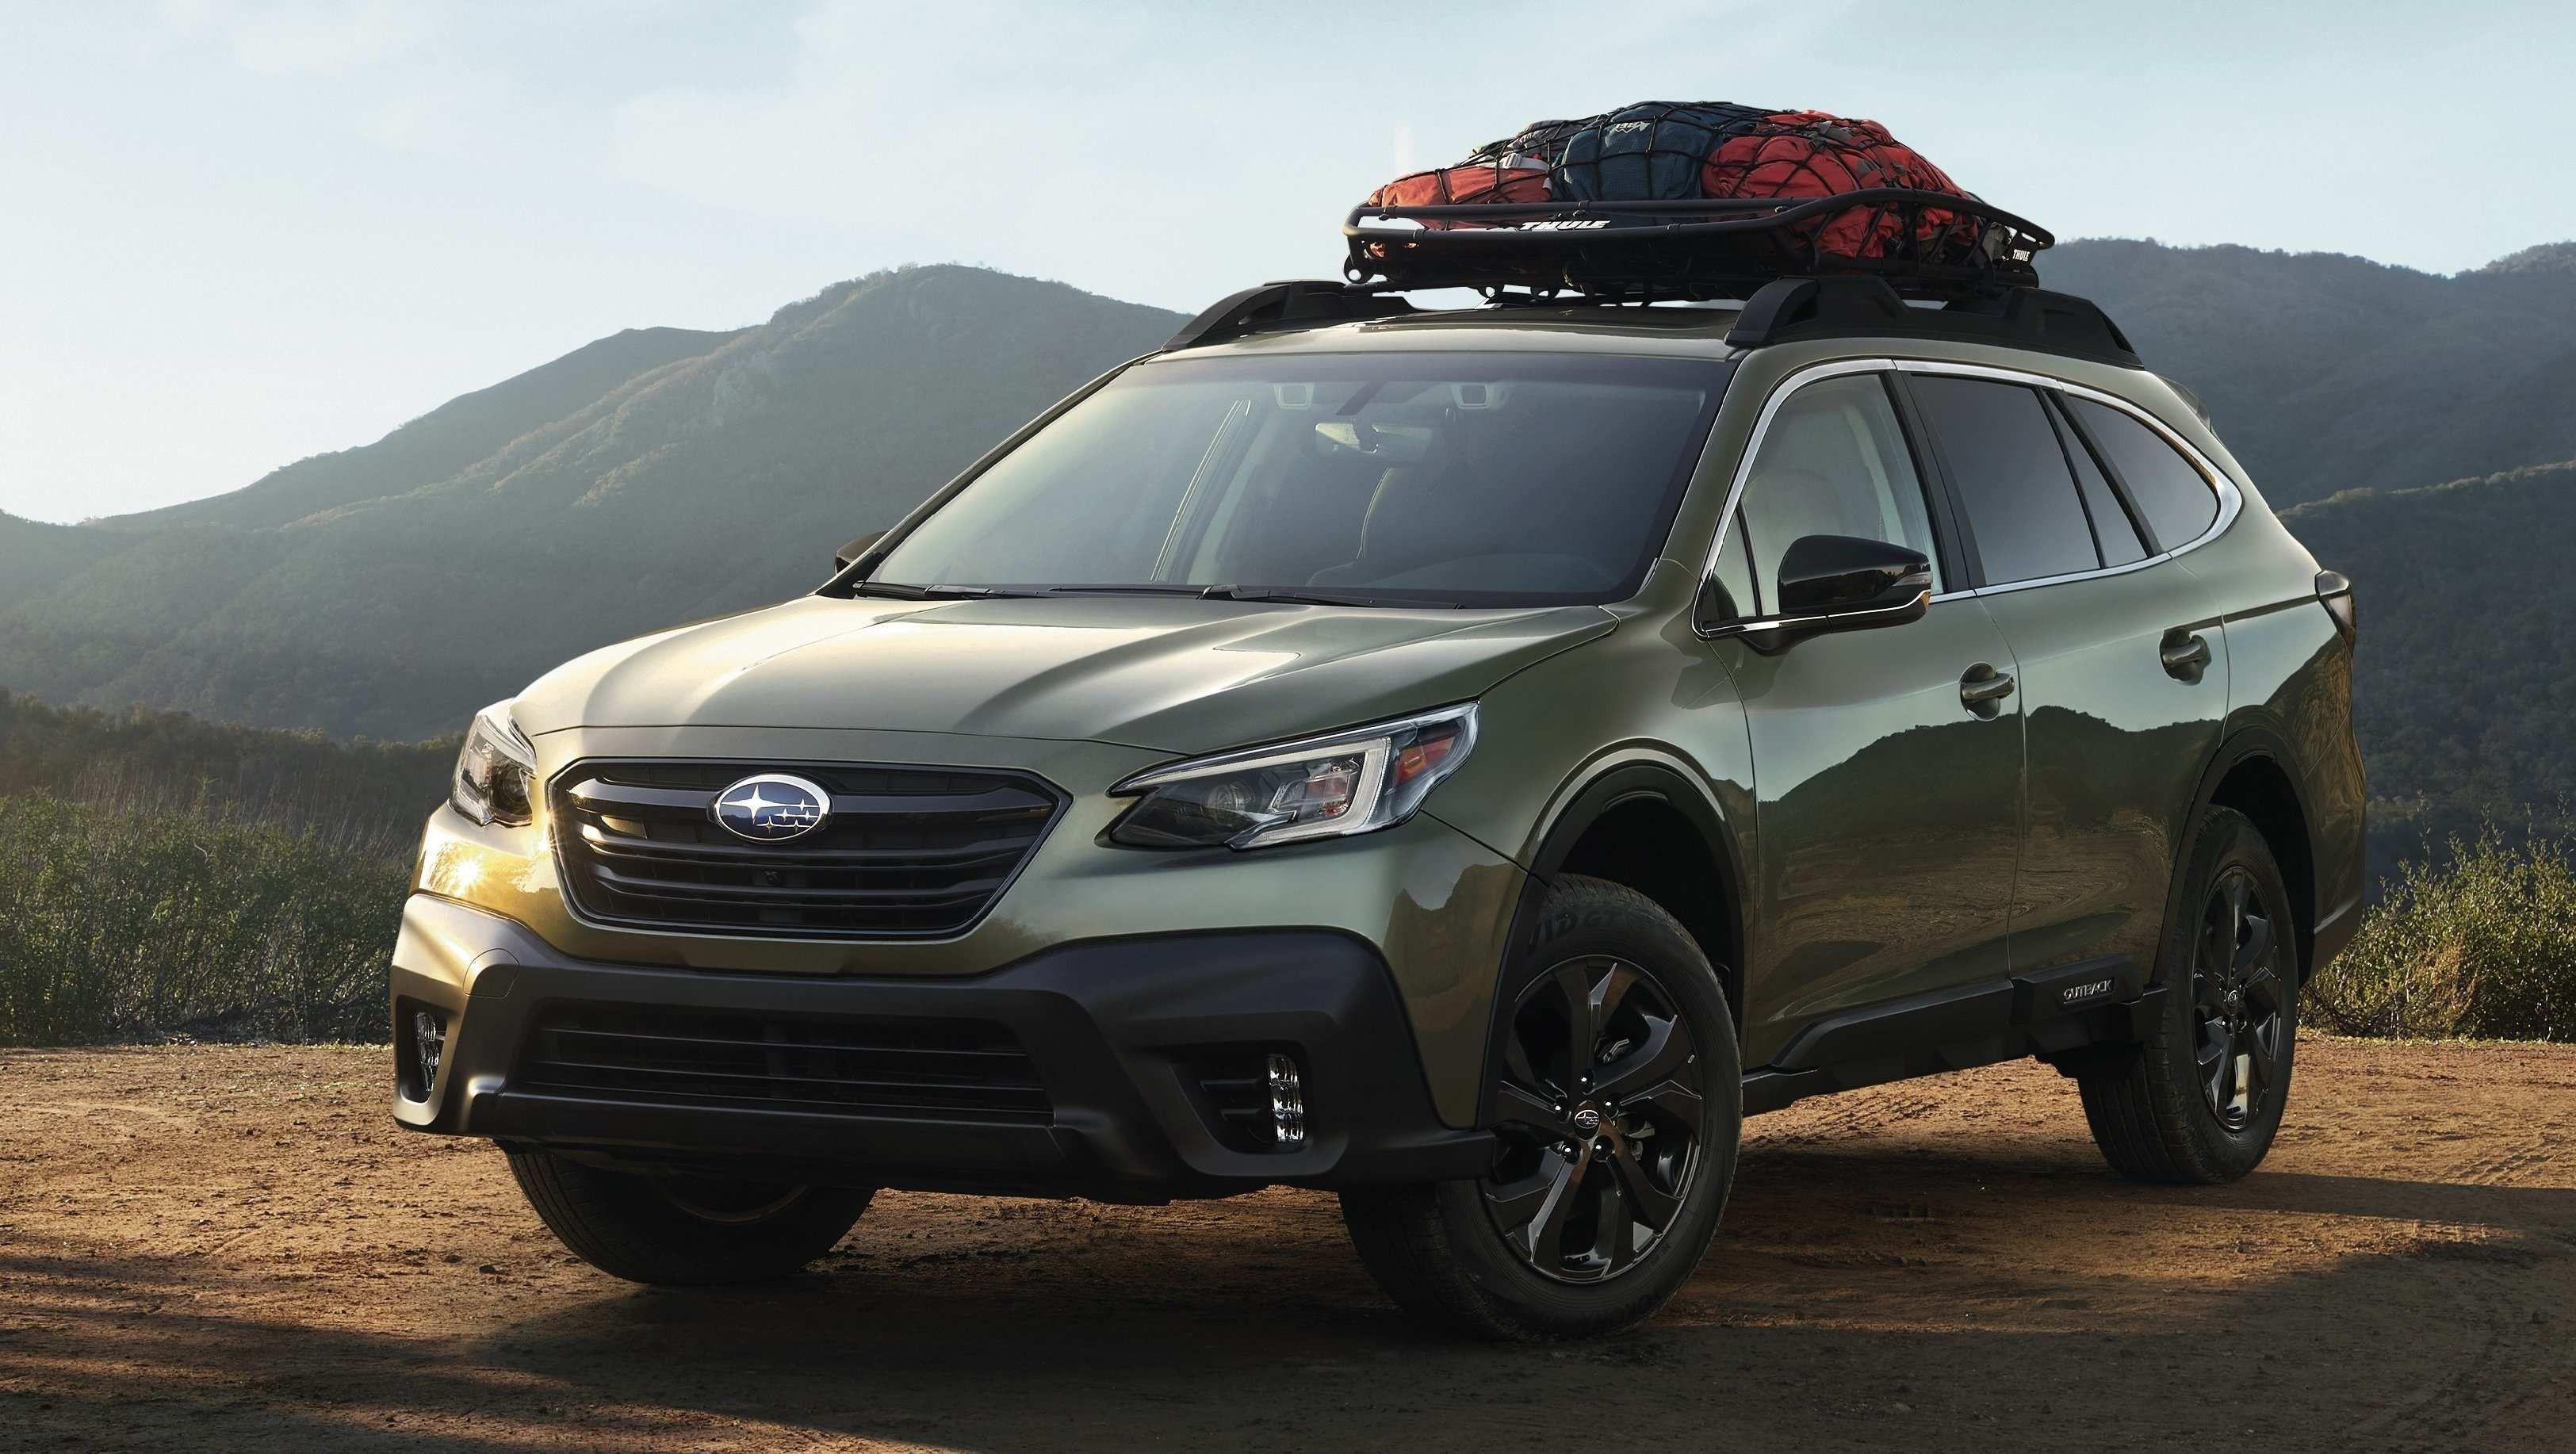 New 2020 Subaru Baja Price Specs Interior New 2020 Subaru Baja Price Specs Interior There Are Currently No New Compact V Subaru Baja Subaru Pickup Trucks